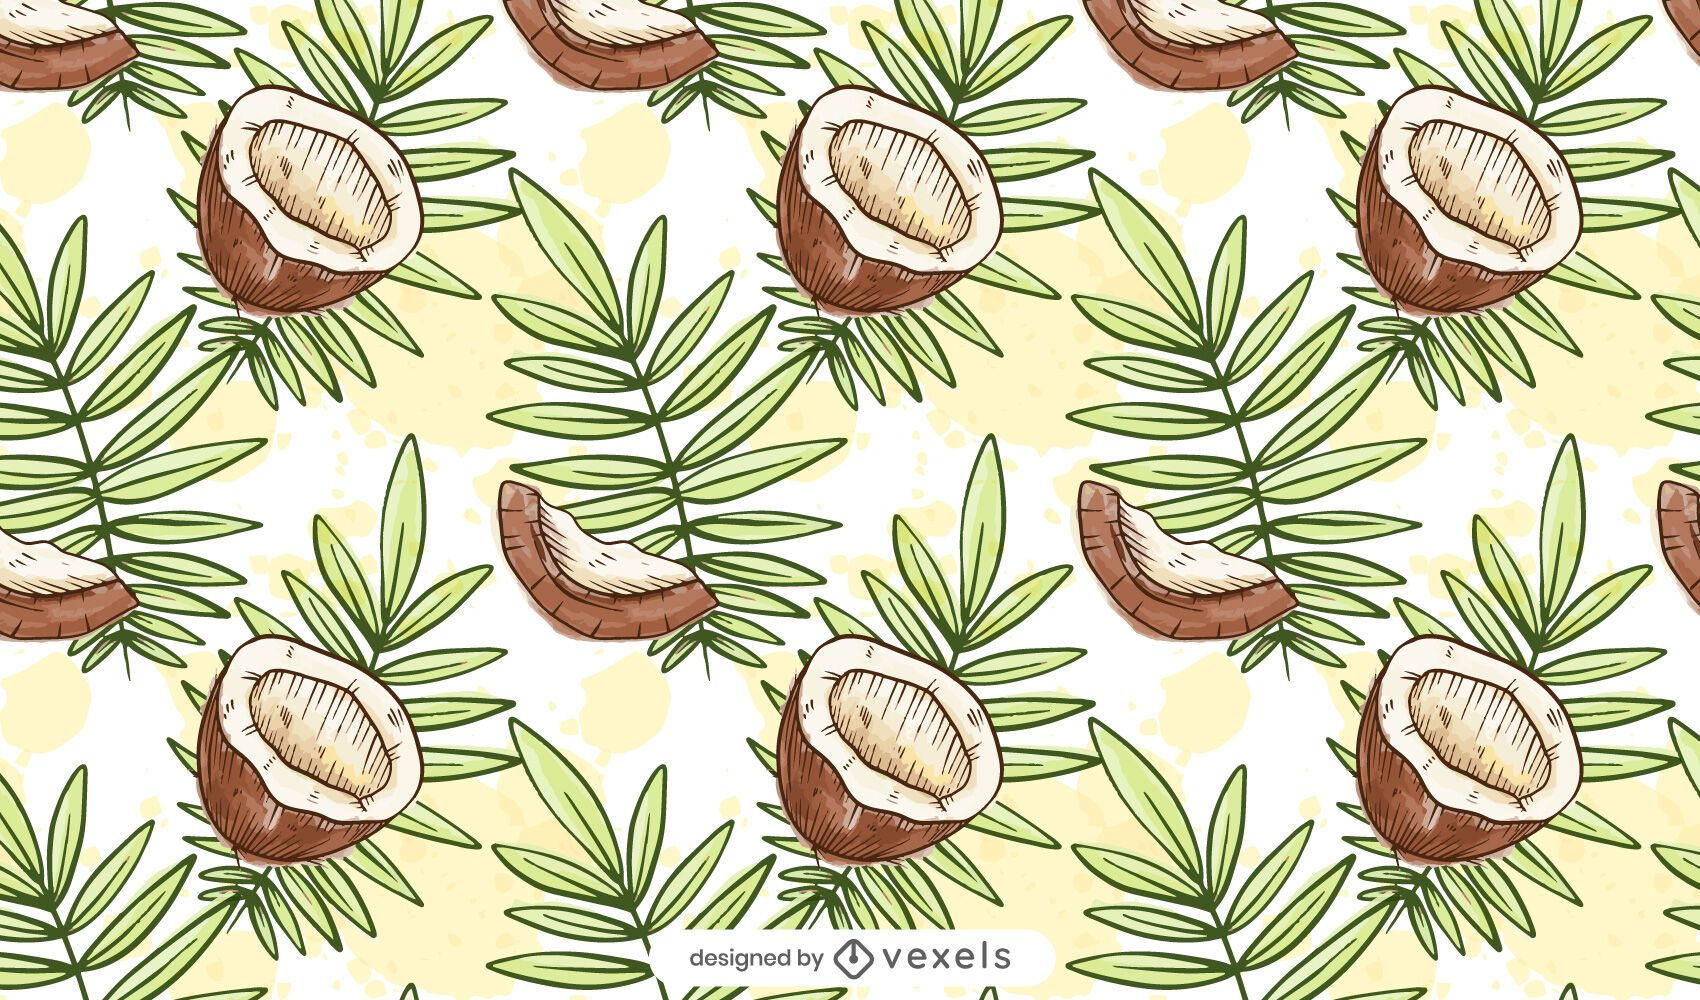 Watercolor coconut pattern design